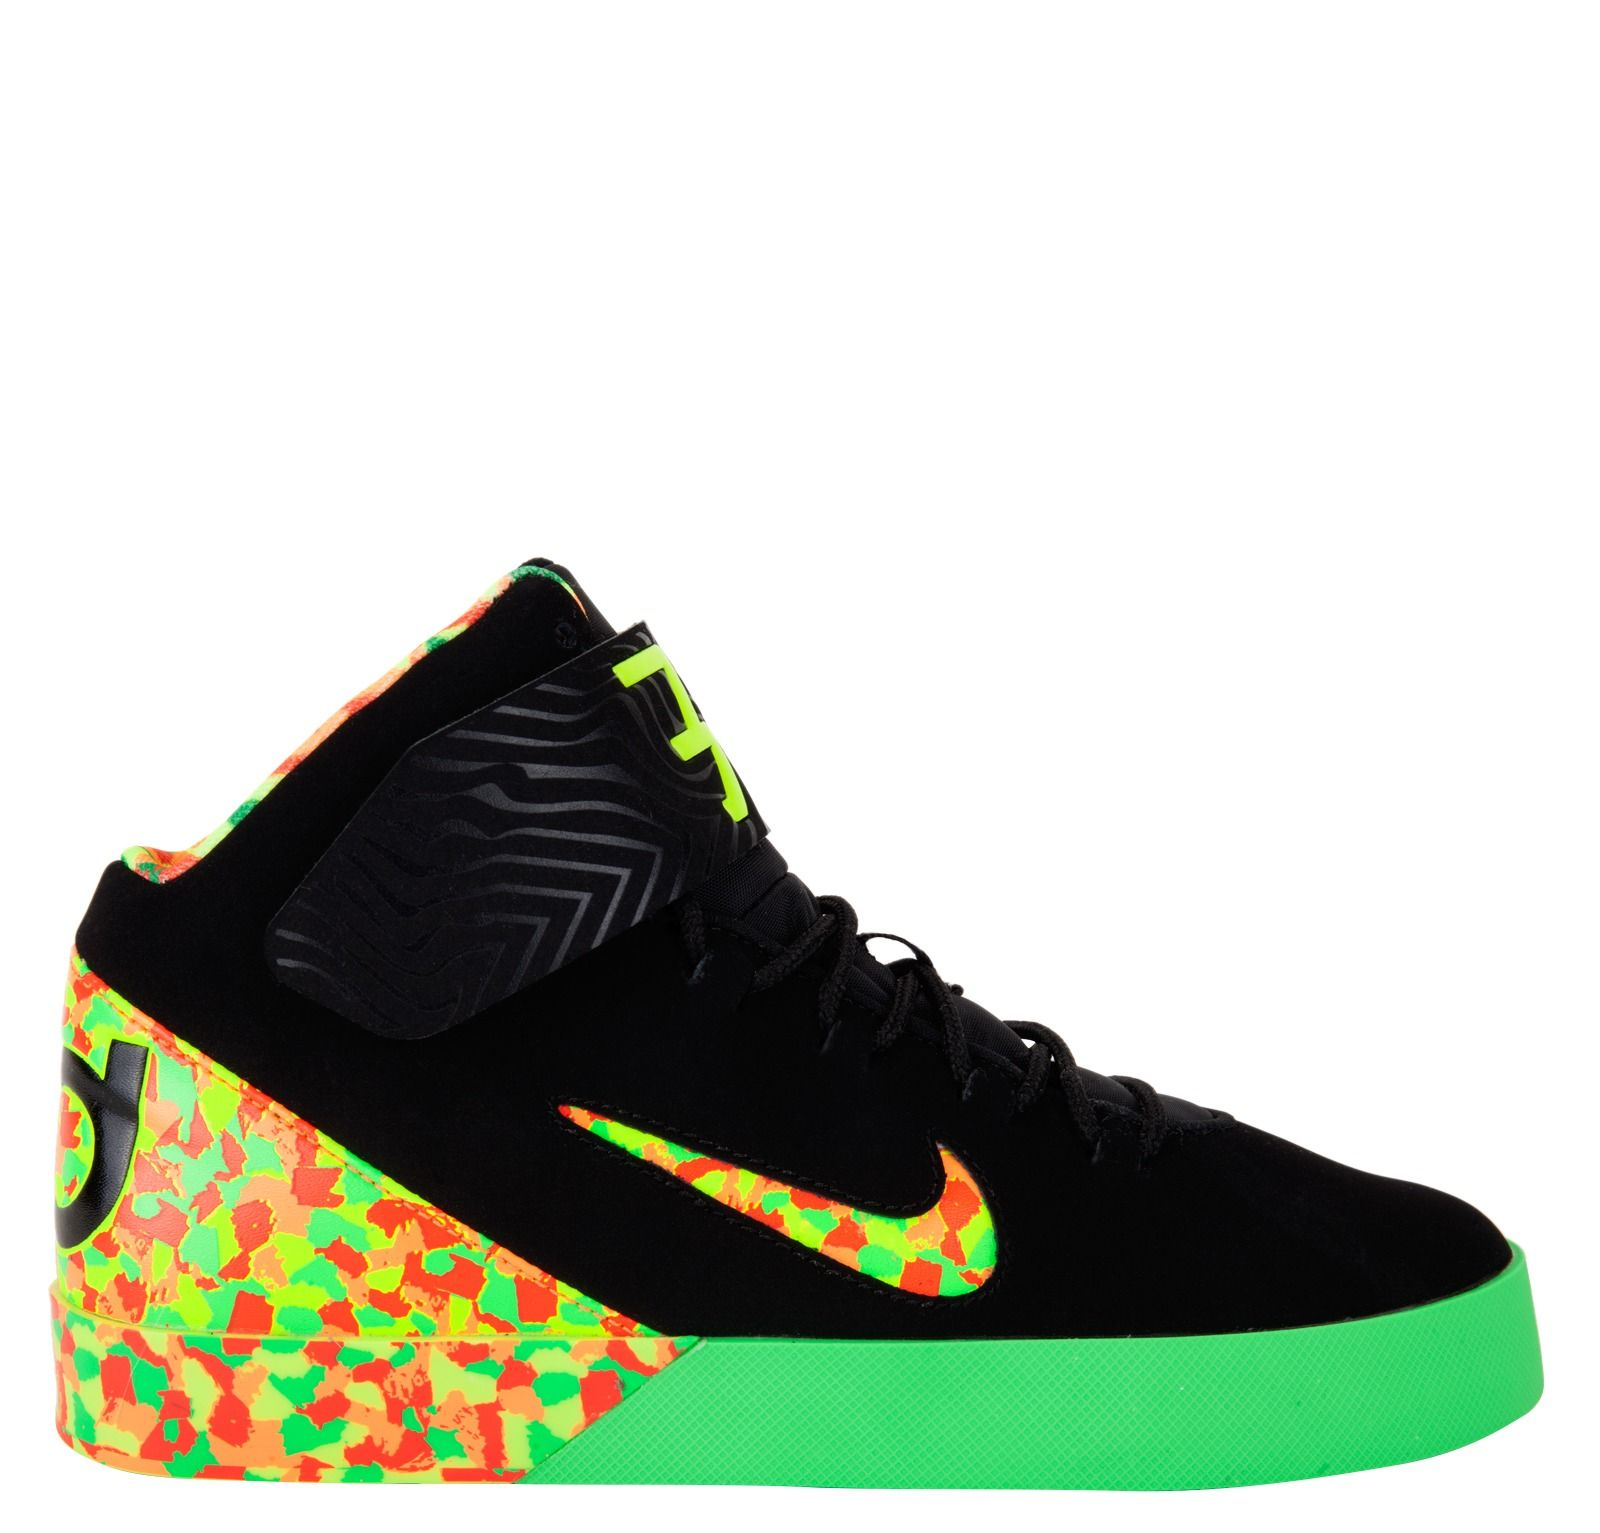 kd high top shoes for kids | Nike Kids KD Vulc Mid Grade School - Black